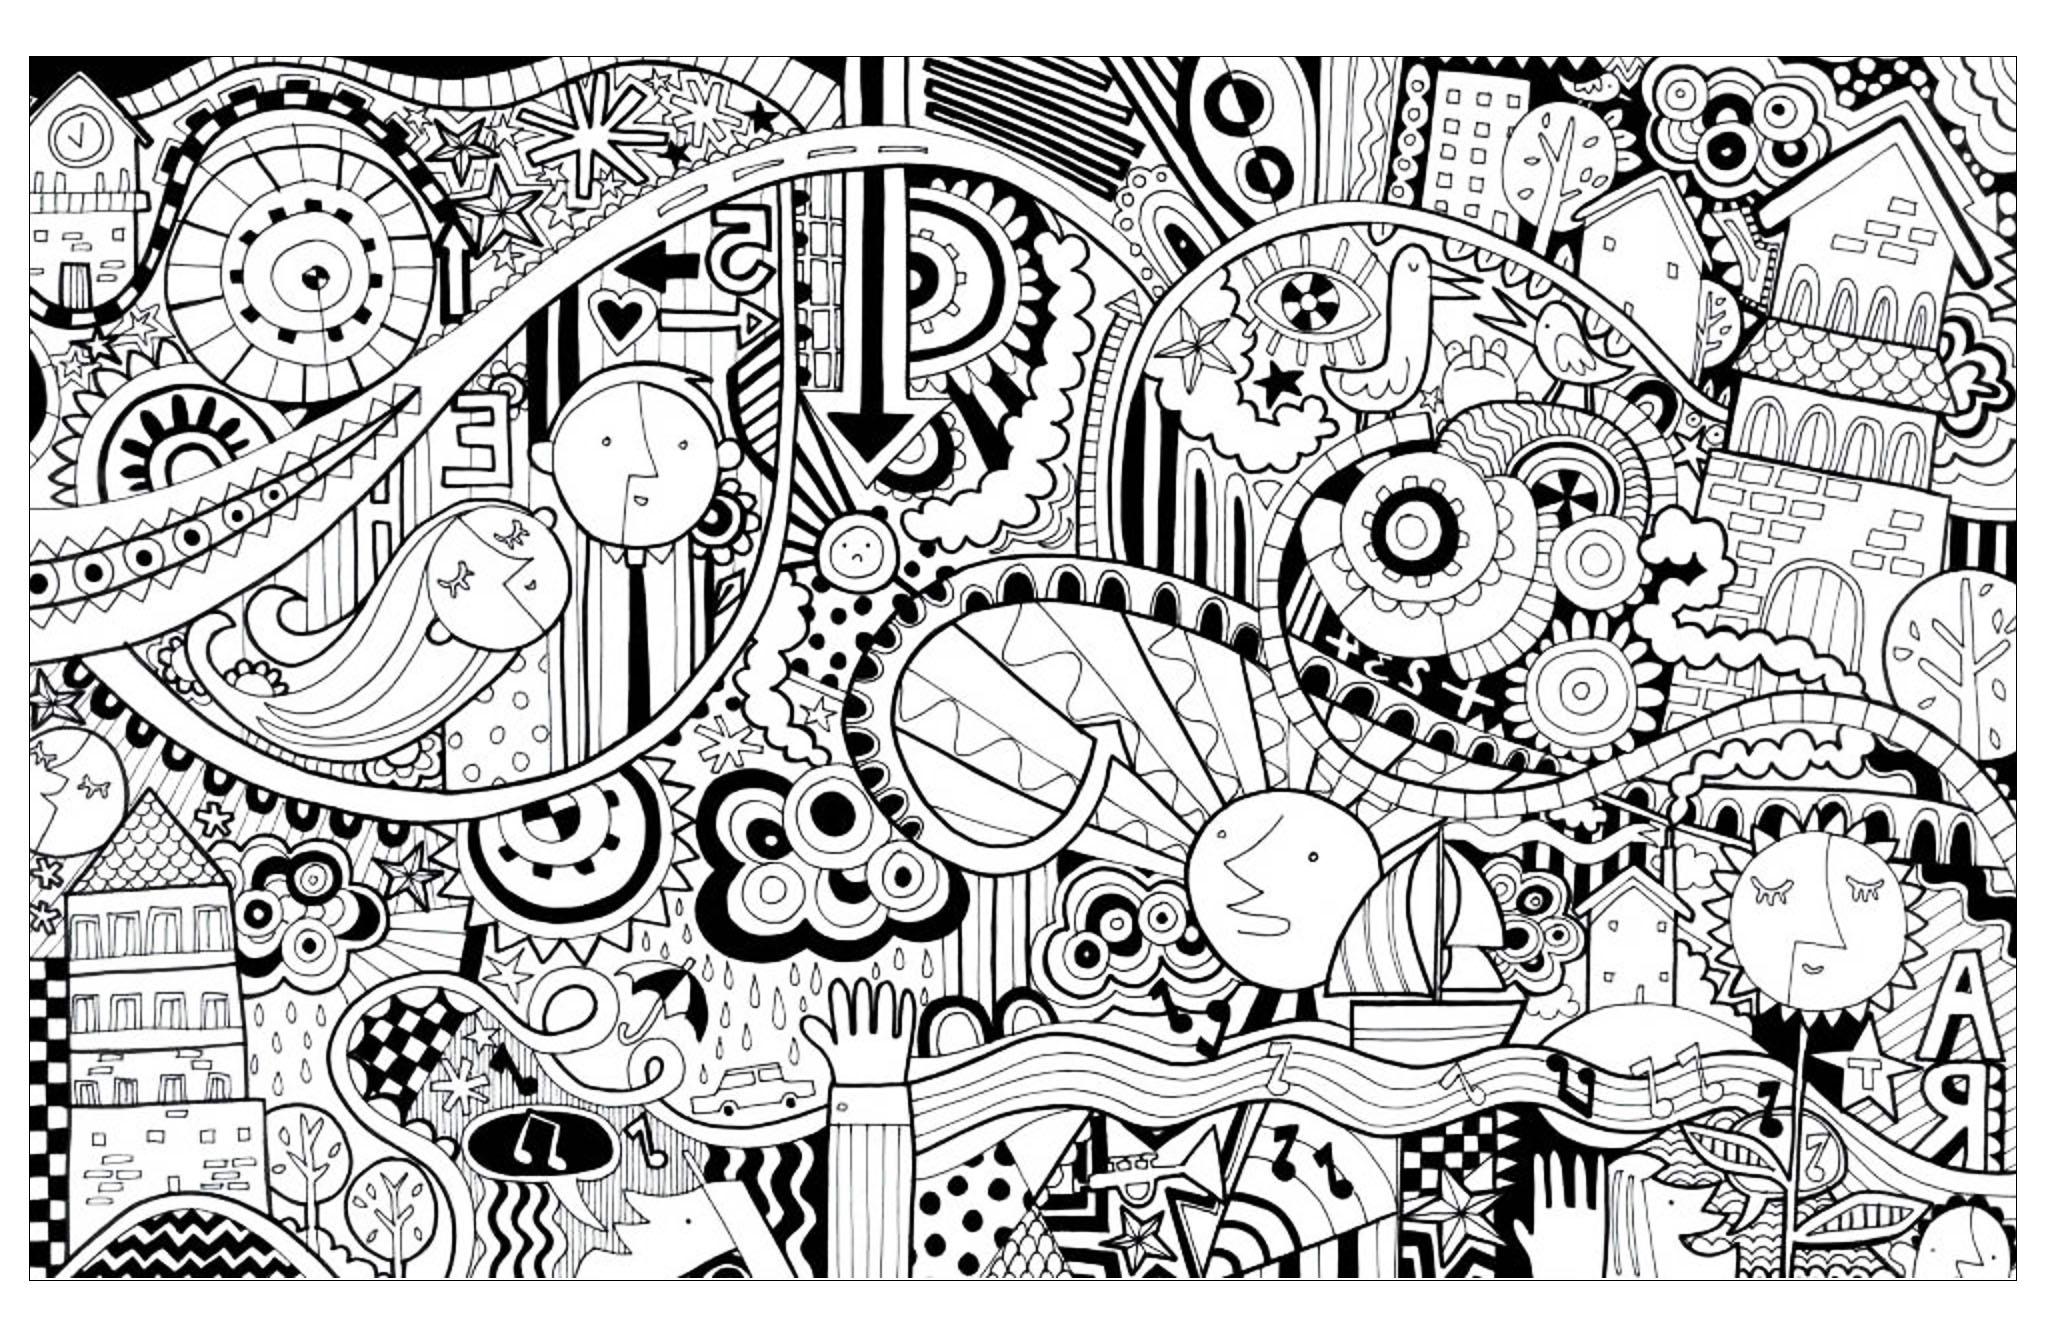 Disegni da colorare per adulti : Doodle art / Doodling - 46